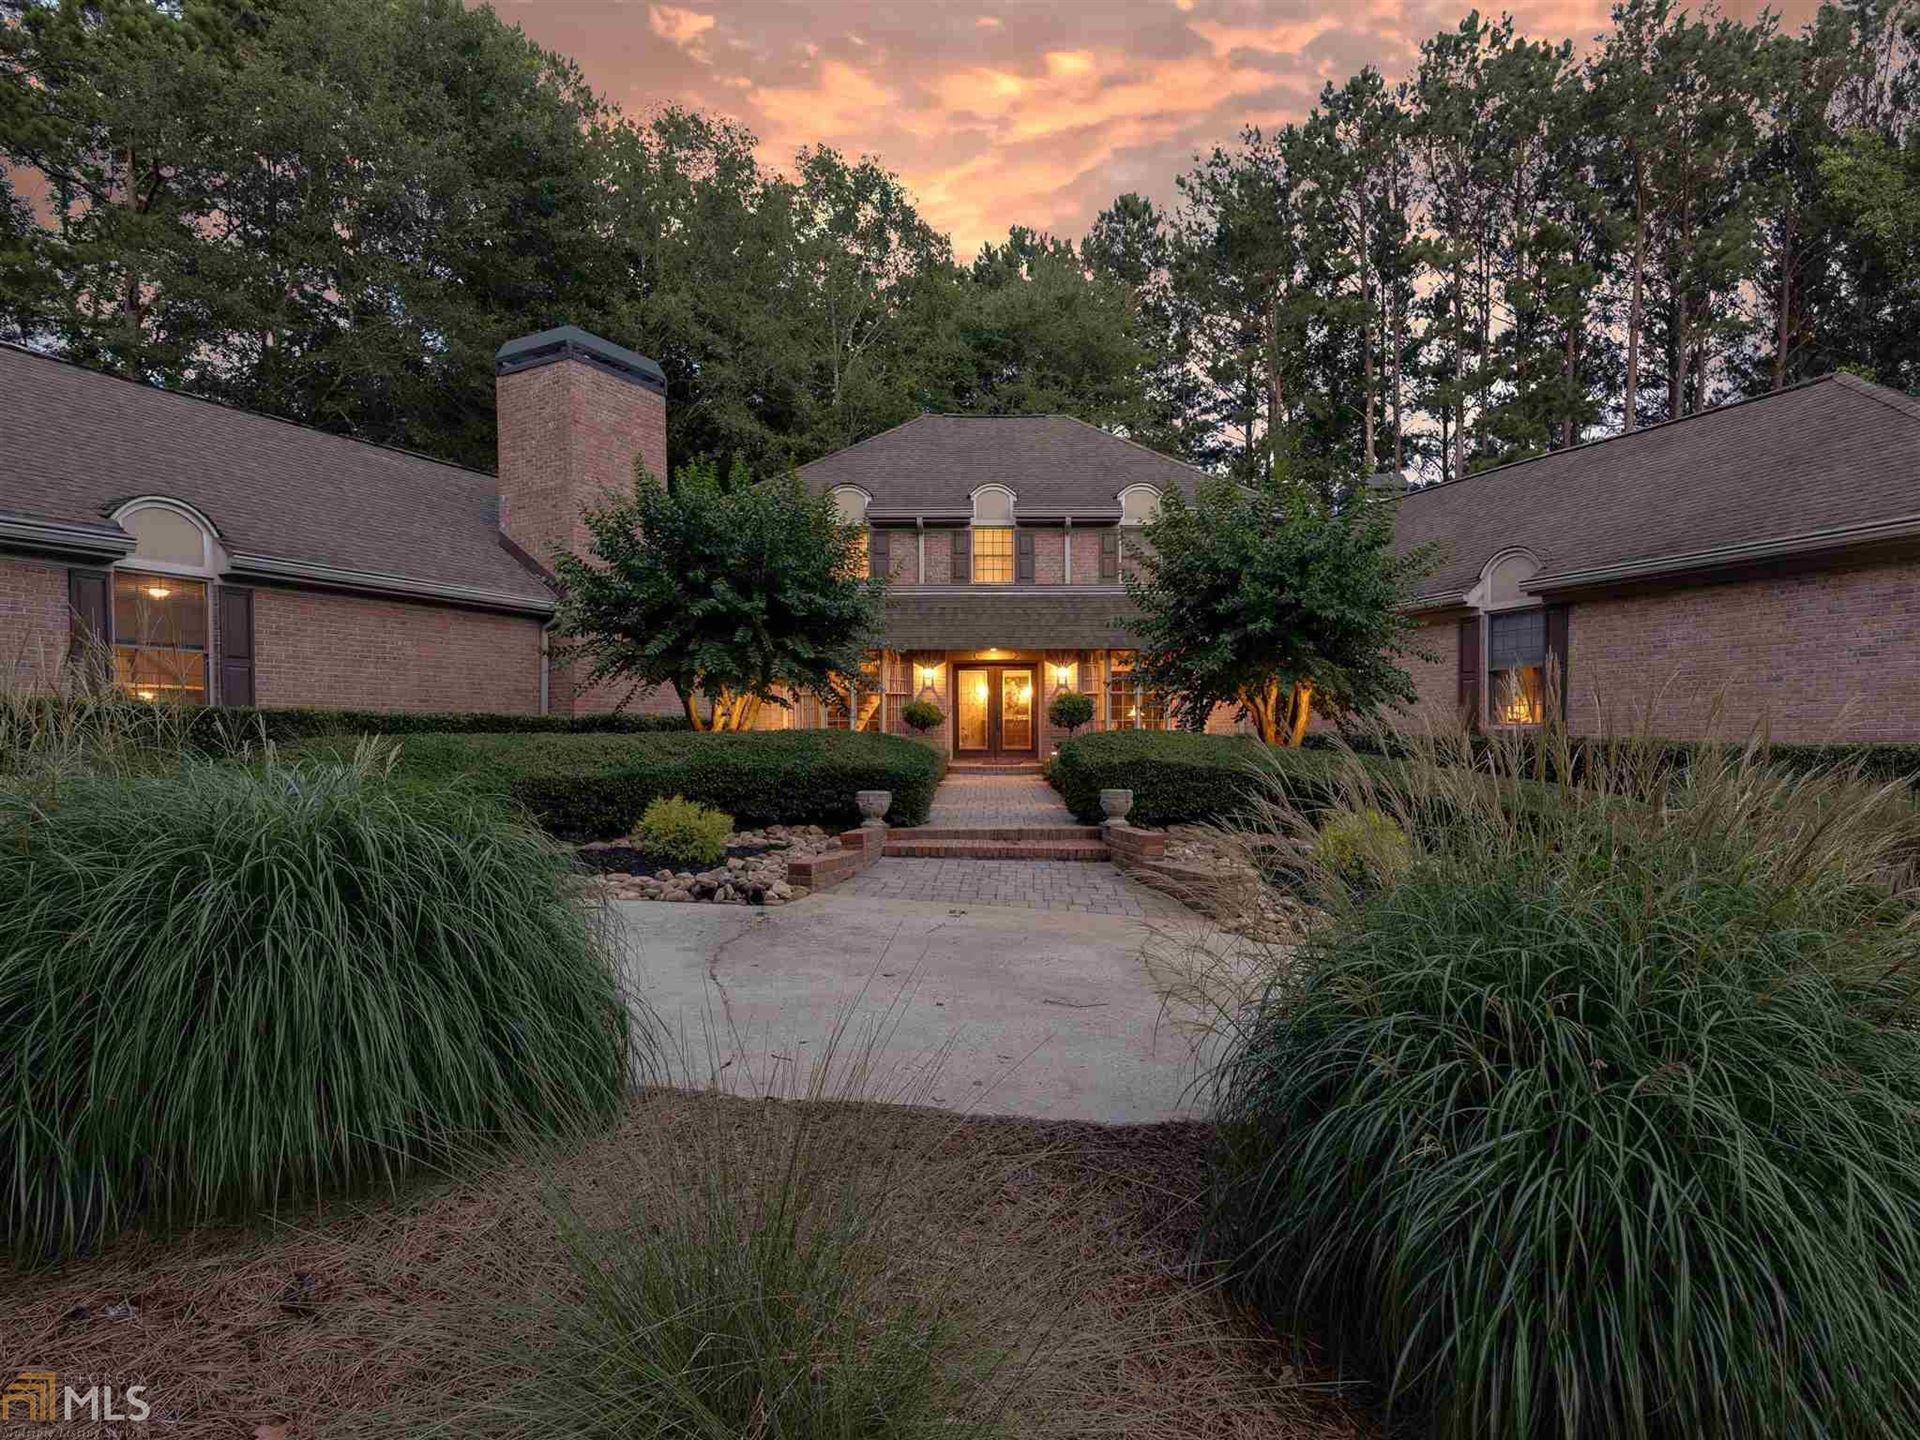 125 Broadmoor Dr, Fayetteville, GA 30215 - #: 8832416